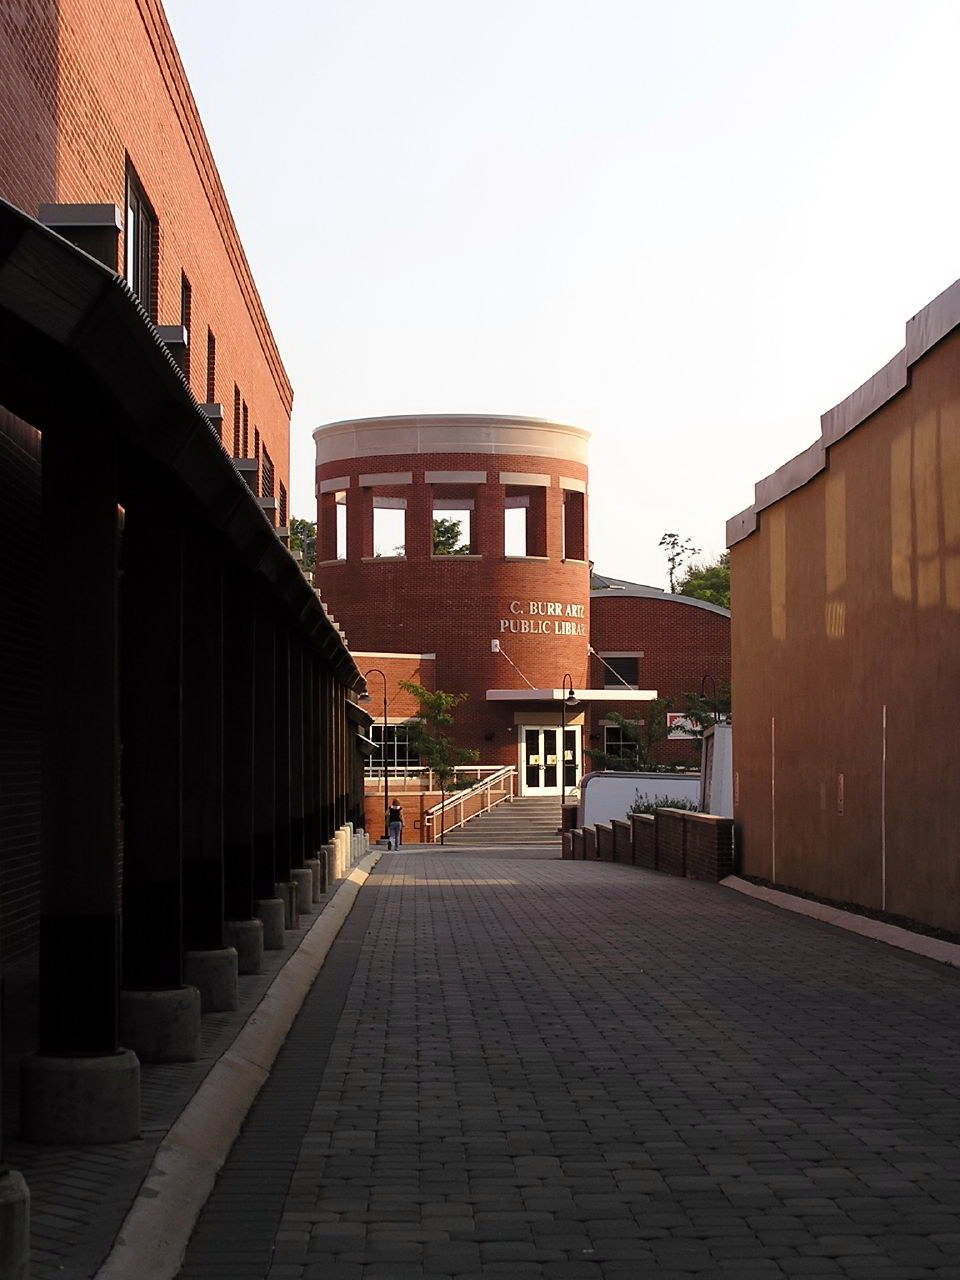 Frederick Public Library